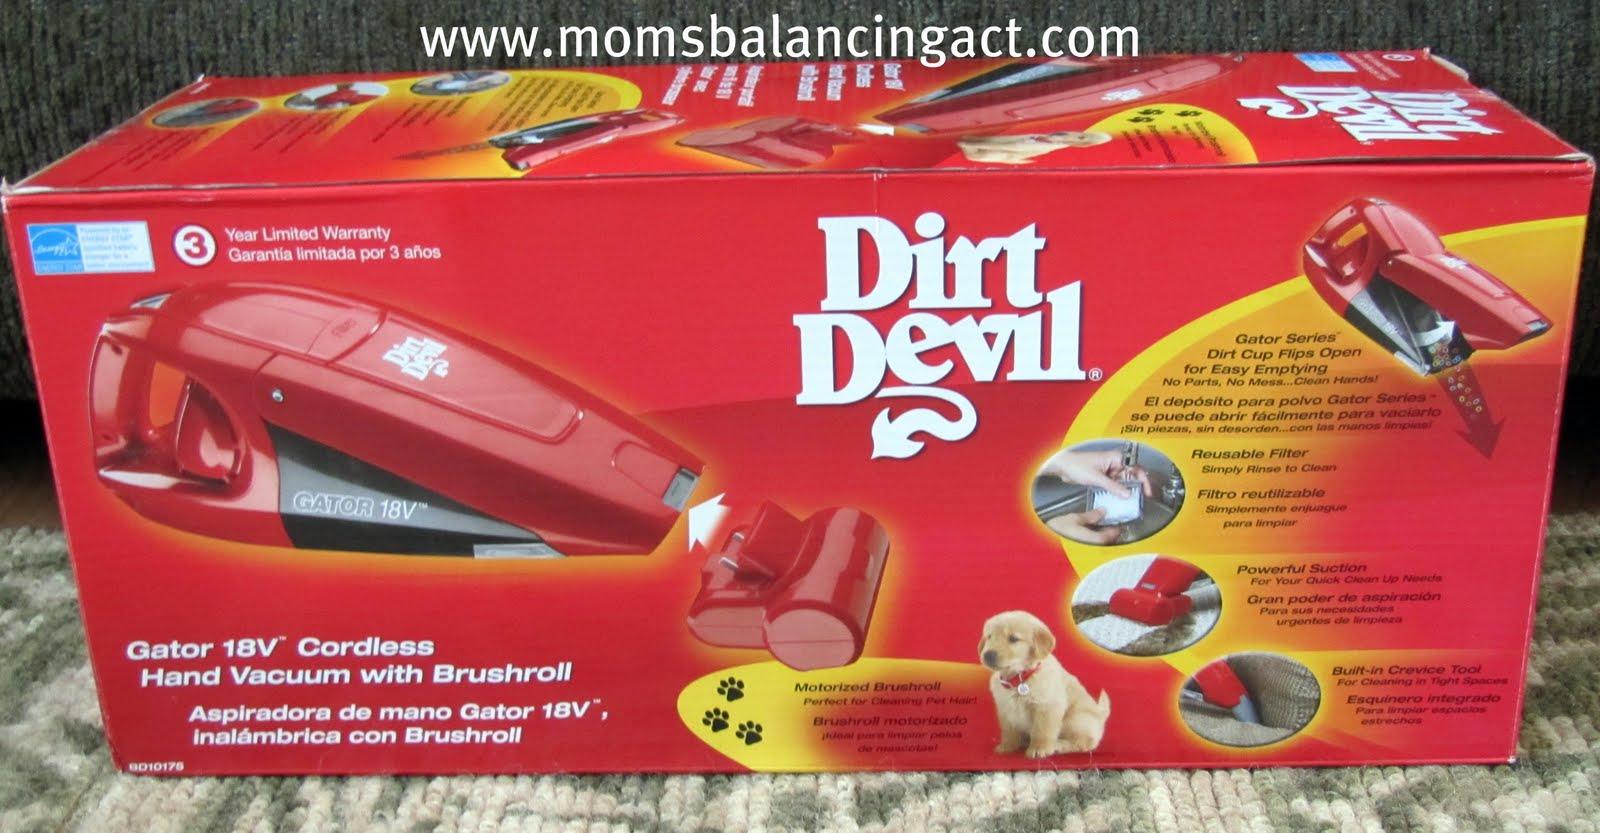 checking our list dirt devil gator 18v cordless hand vacuum with brushroll review. Black Bedroom Furniture Sets. Home Design Ideas